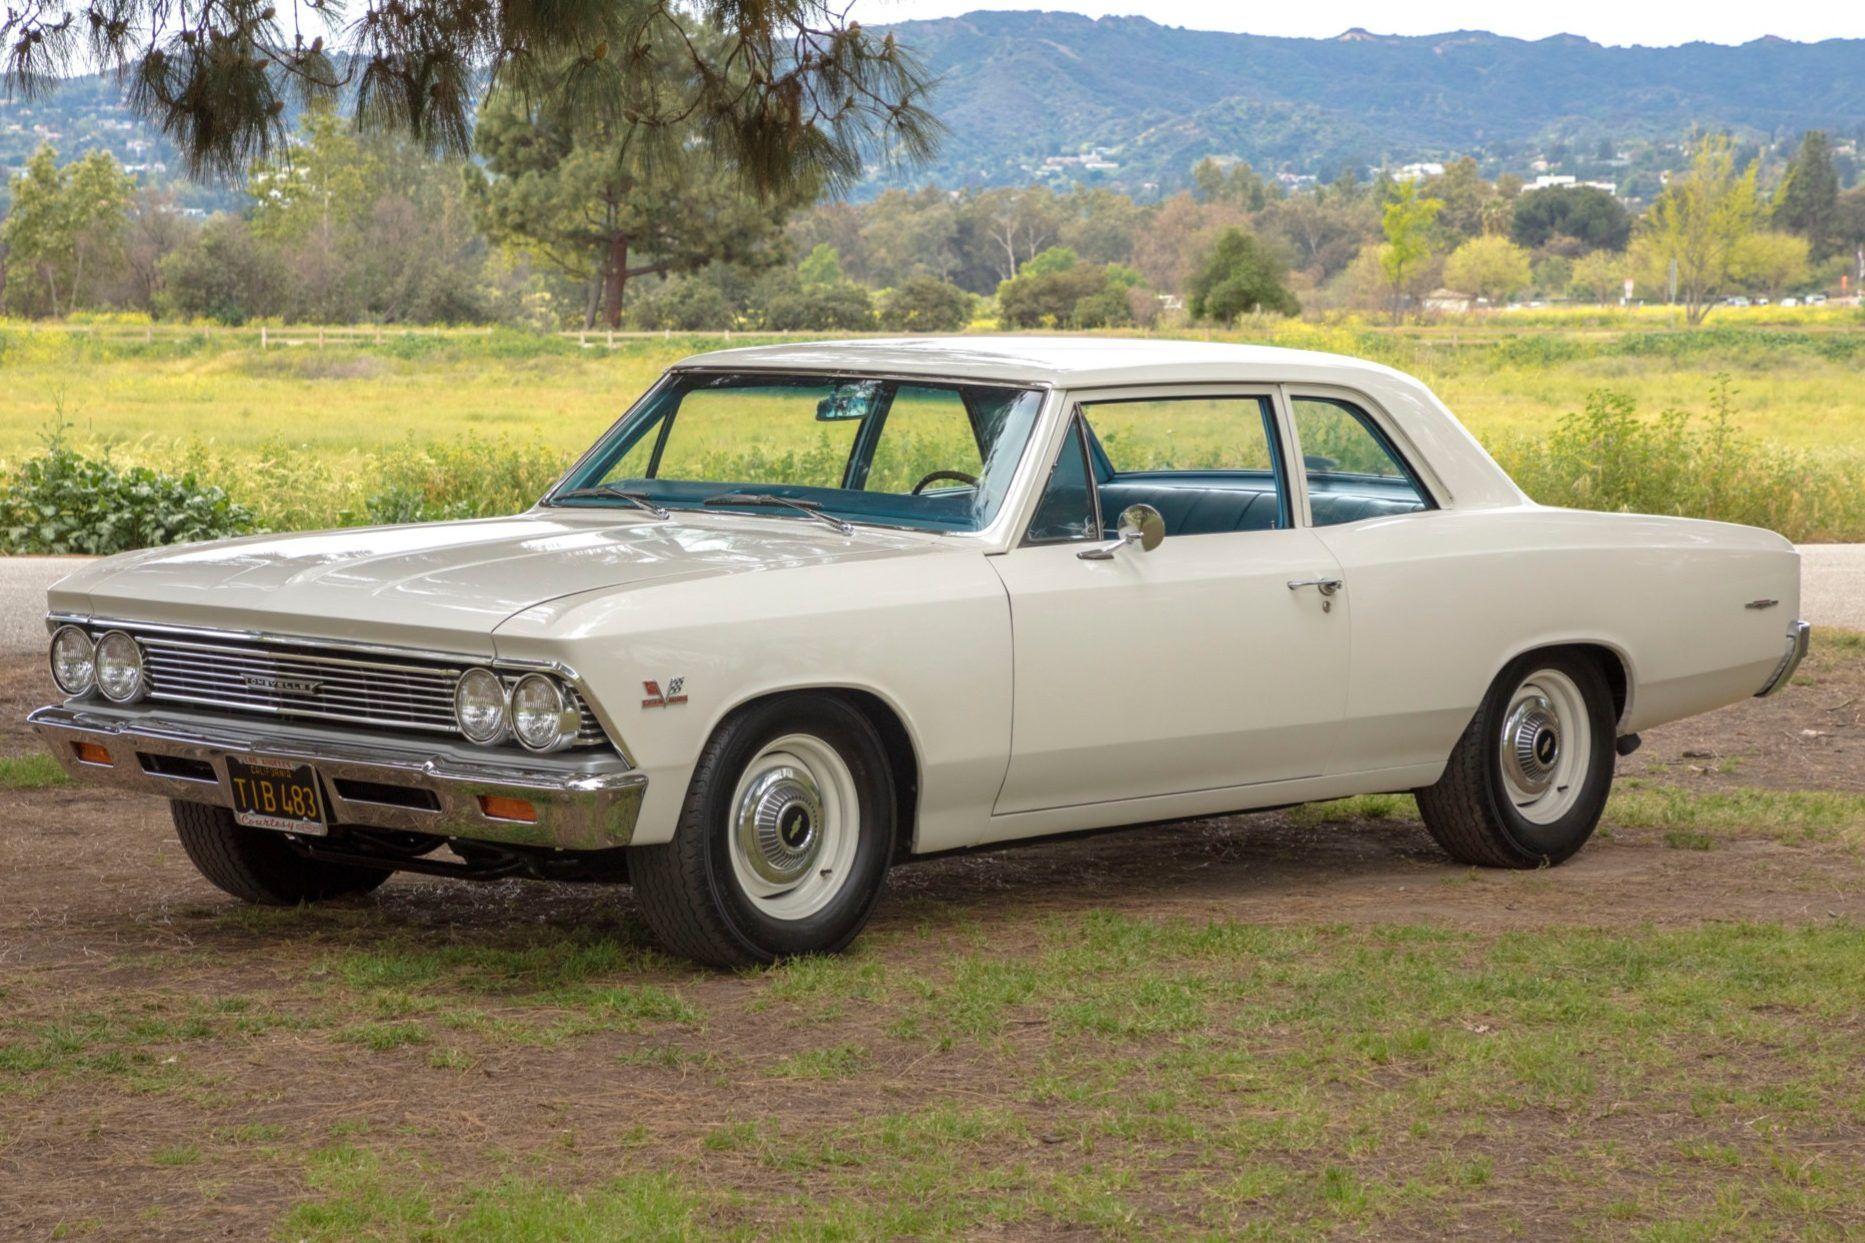 Zl 1 427 Powered 1966 Chevrolet Chevelle 300 4 Speed Chevrolet